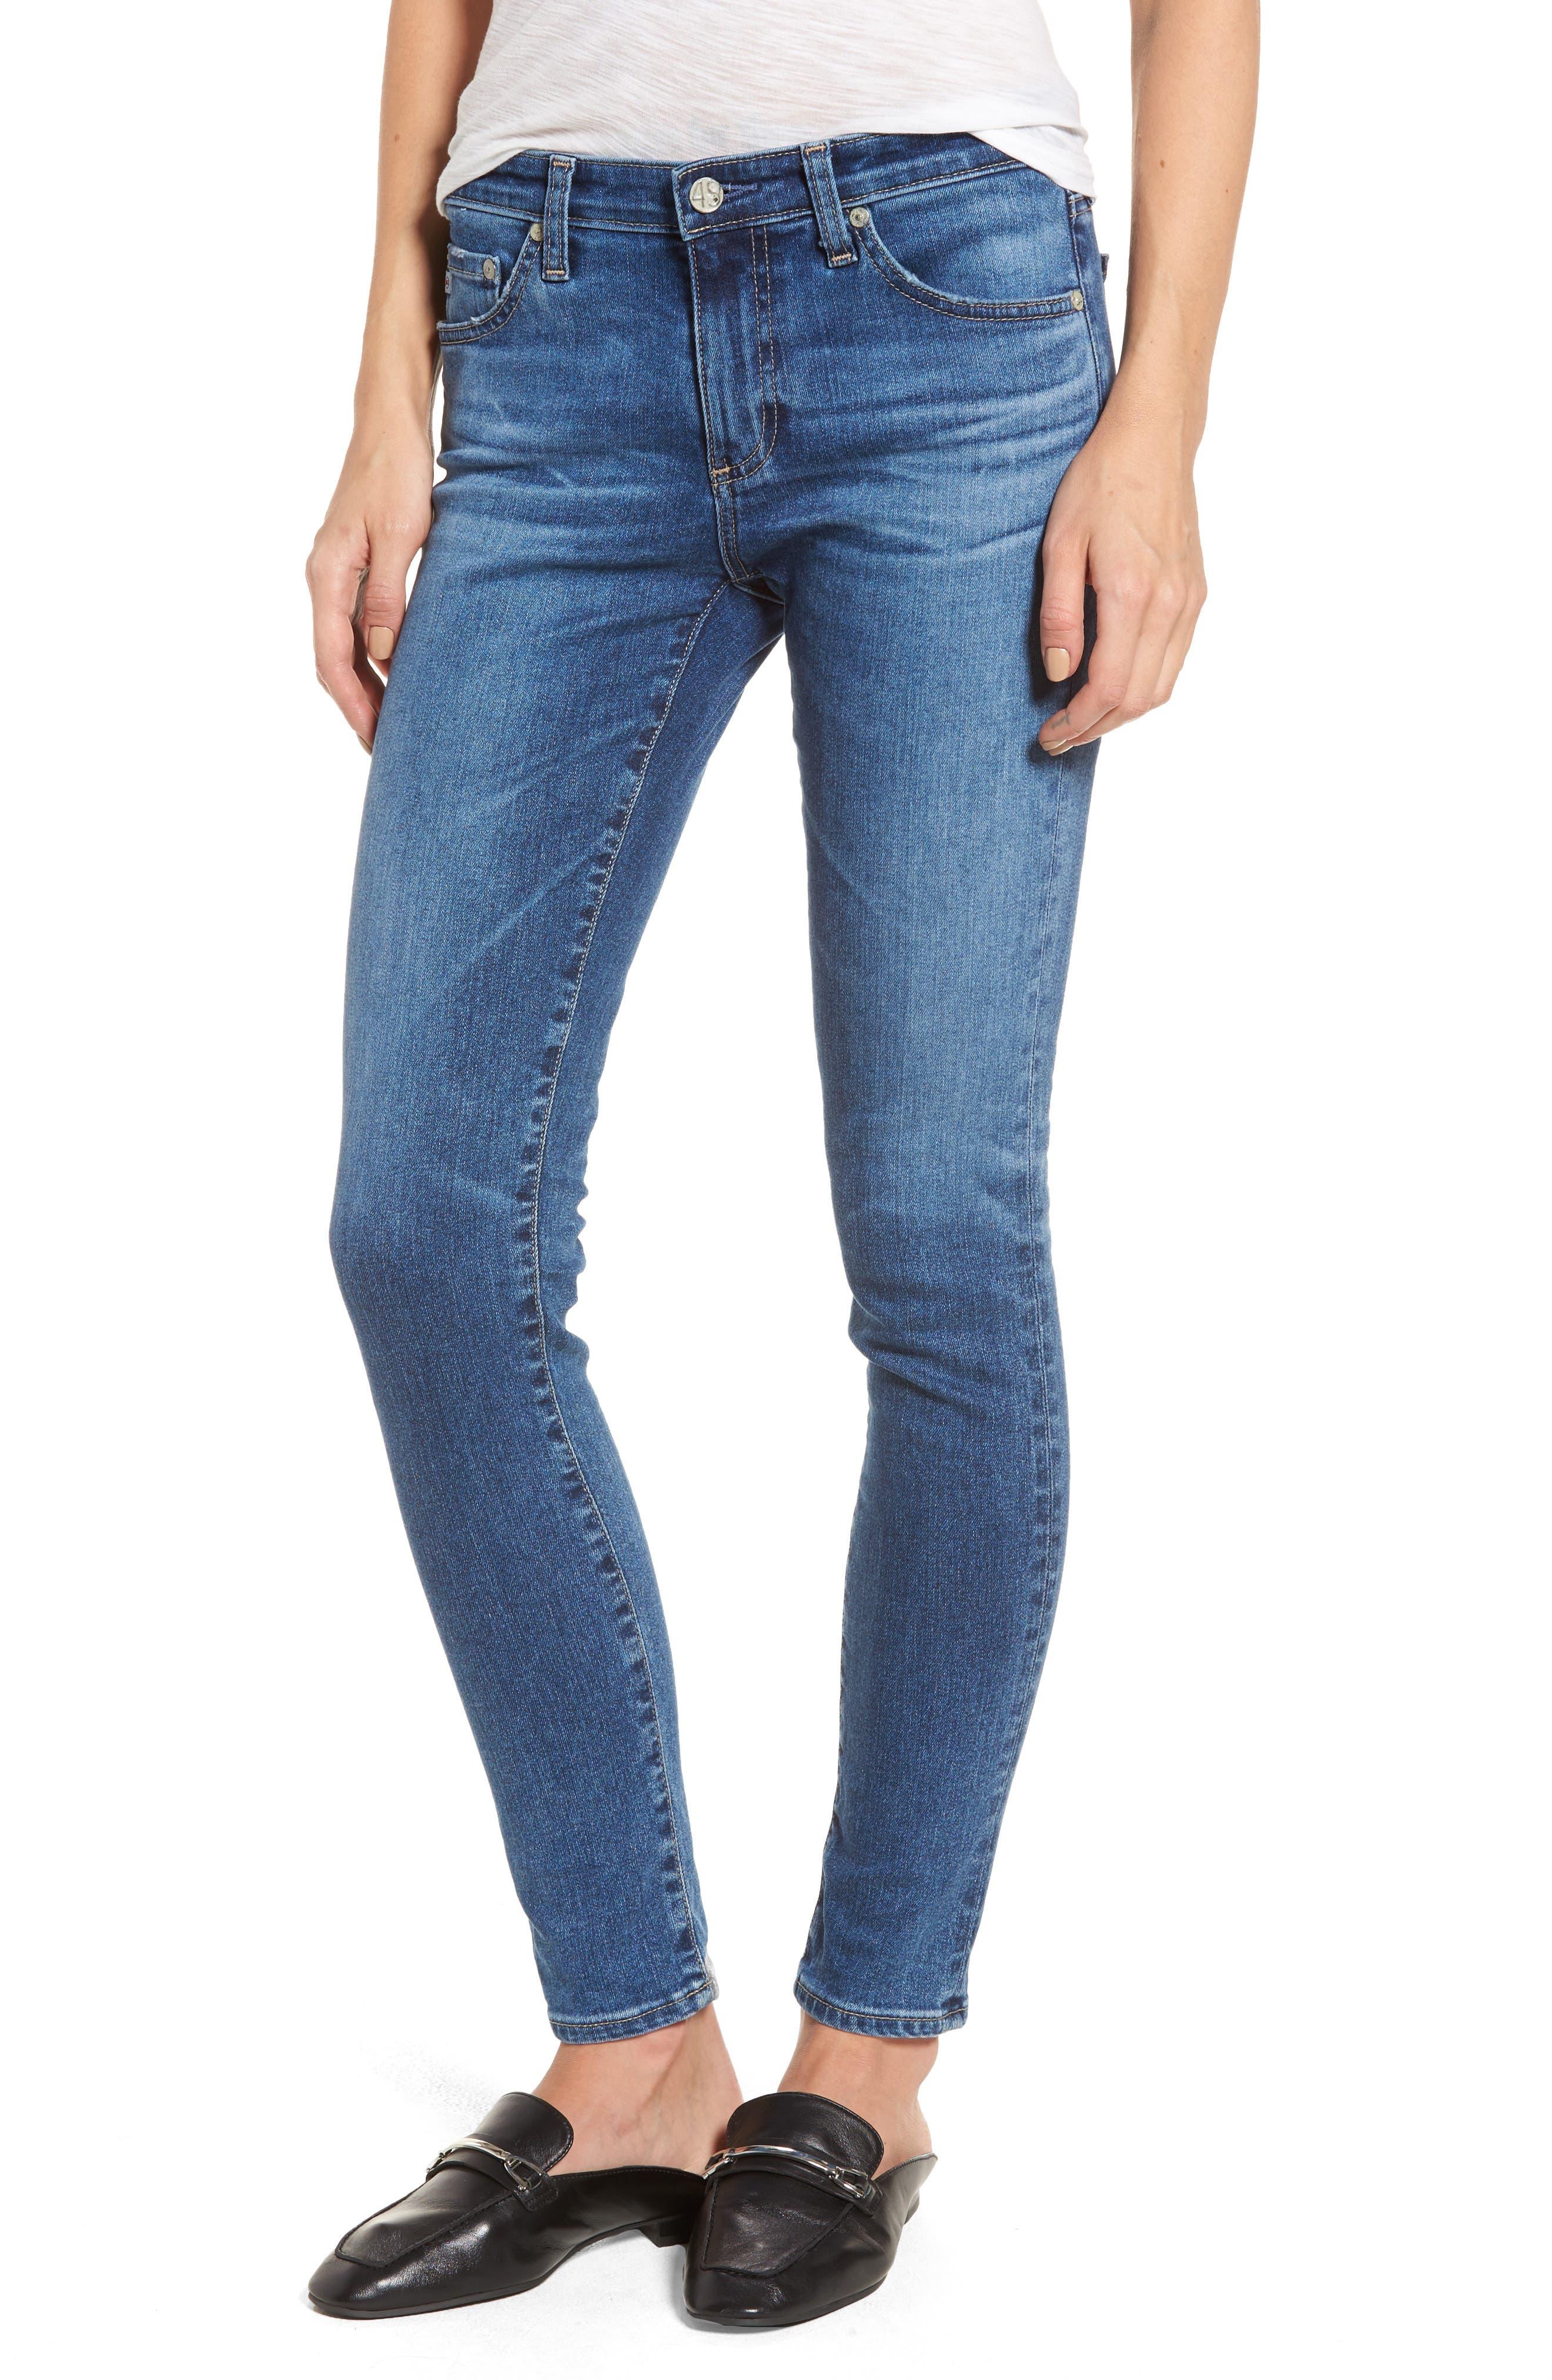 Alternate Image 1 Selected - AG The Legging Ankle Super Skinny Jeans (17 Years Sea Drift)